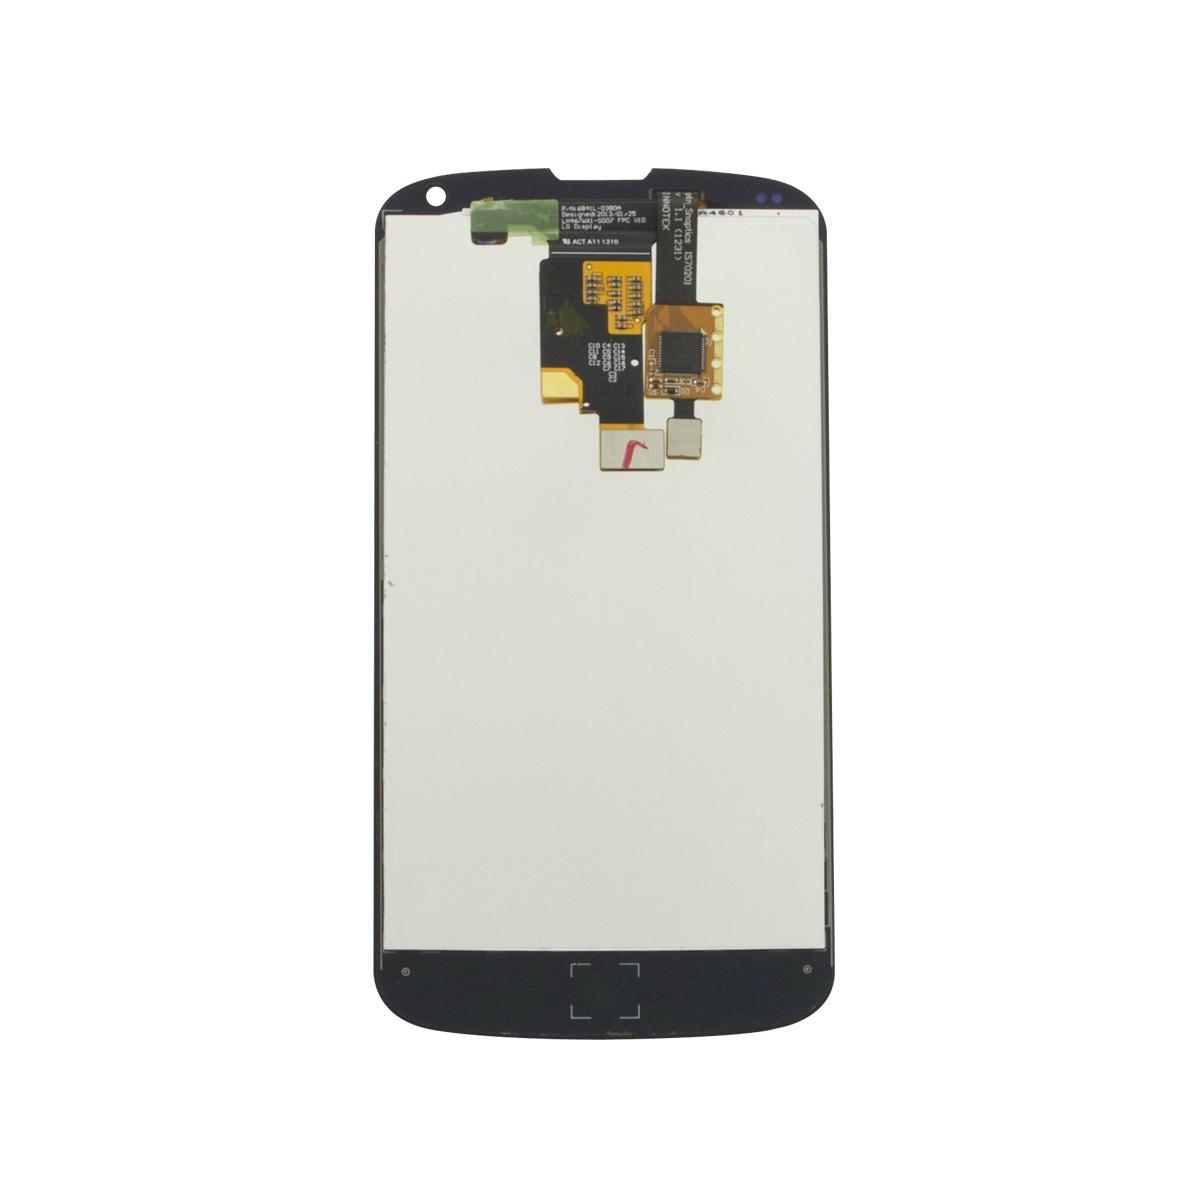 LG Google Nexus 4 E960 LCD & Touch Screen Digitizer Replacement 2